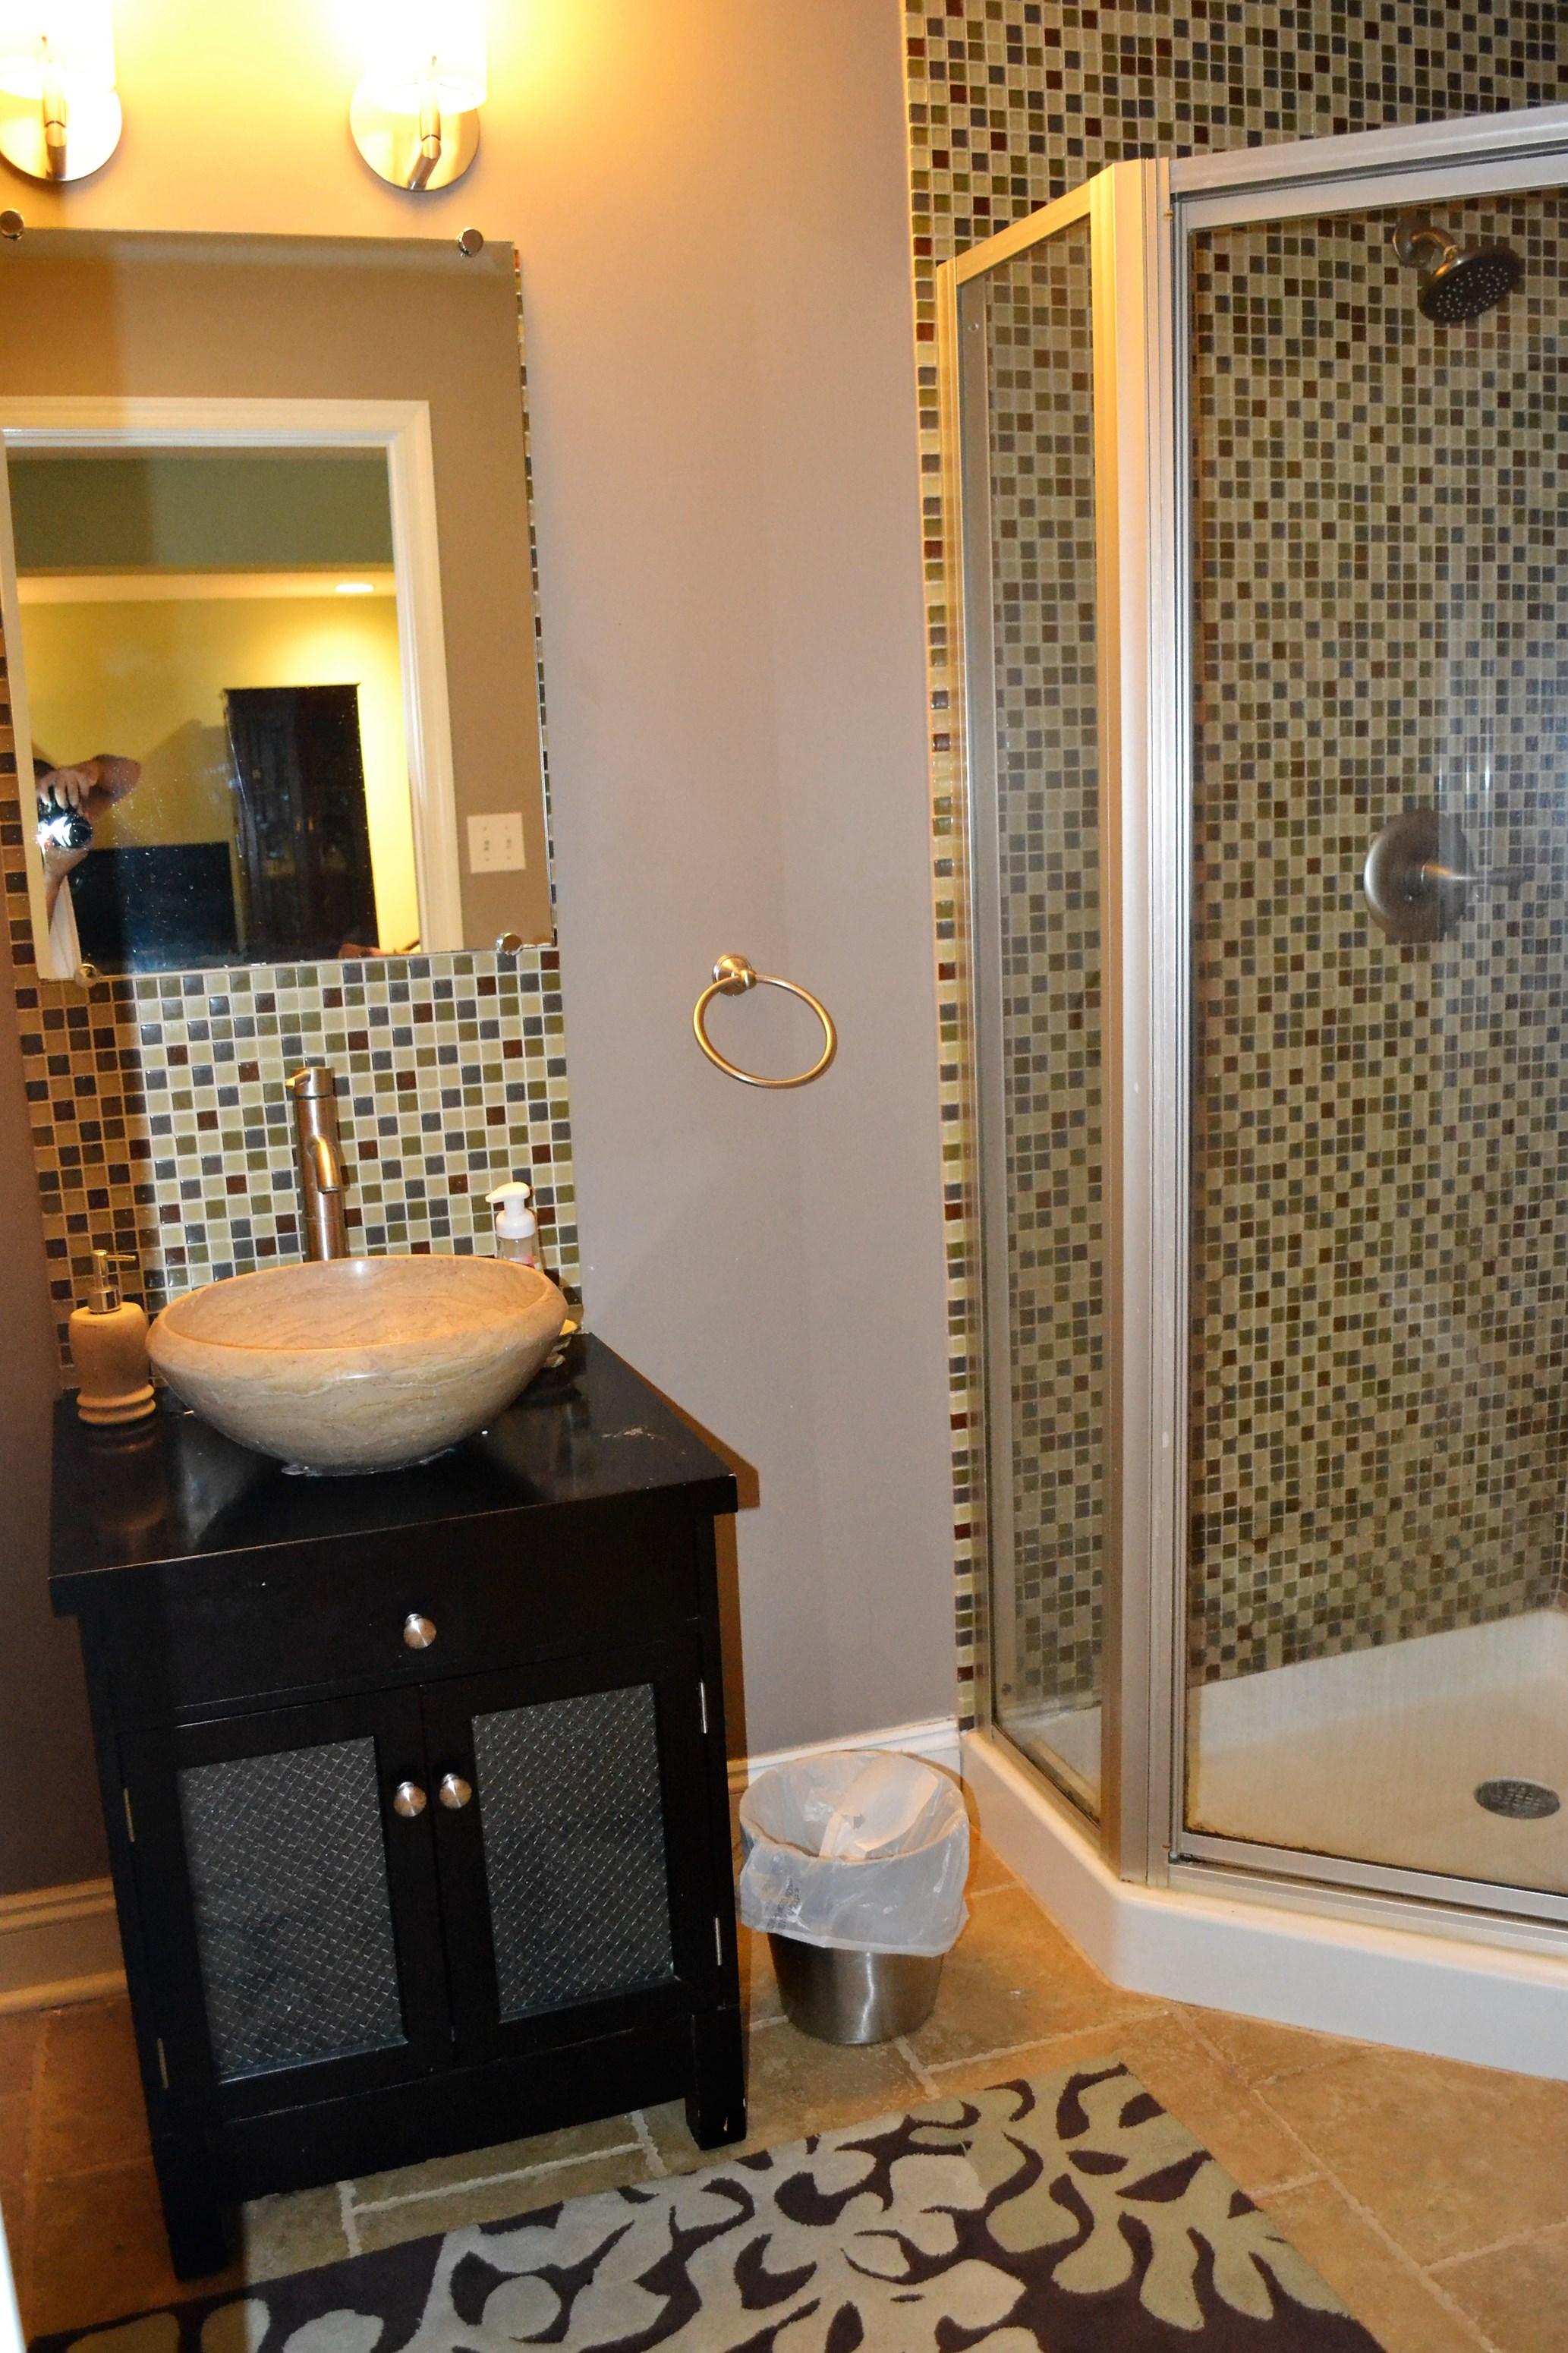 room rental in laurel md izhara in laurel md 760014 sulekha